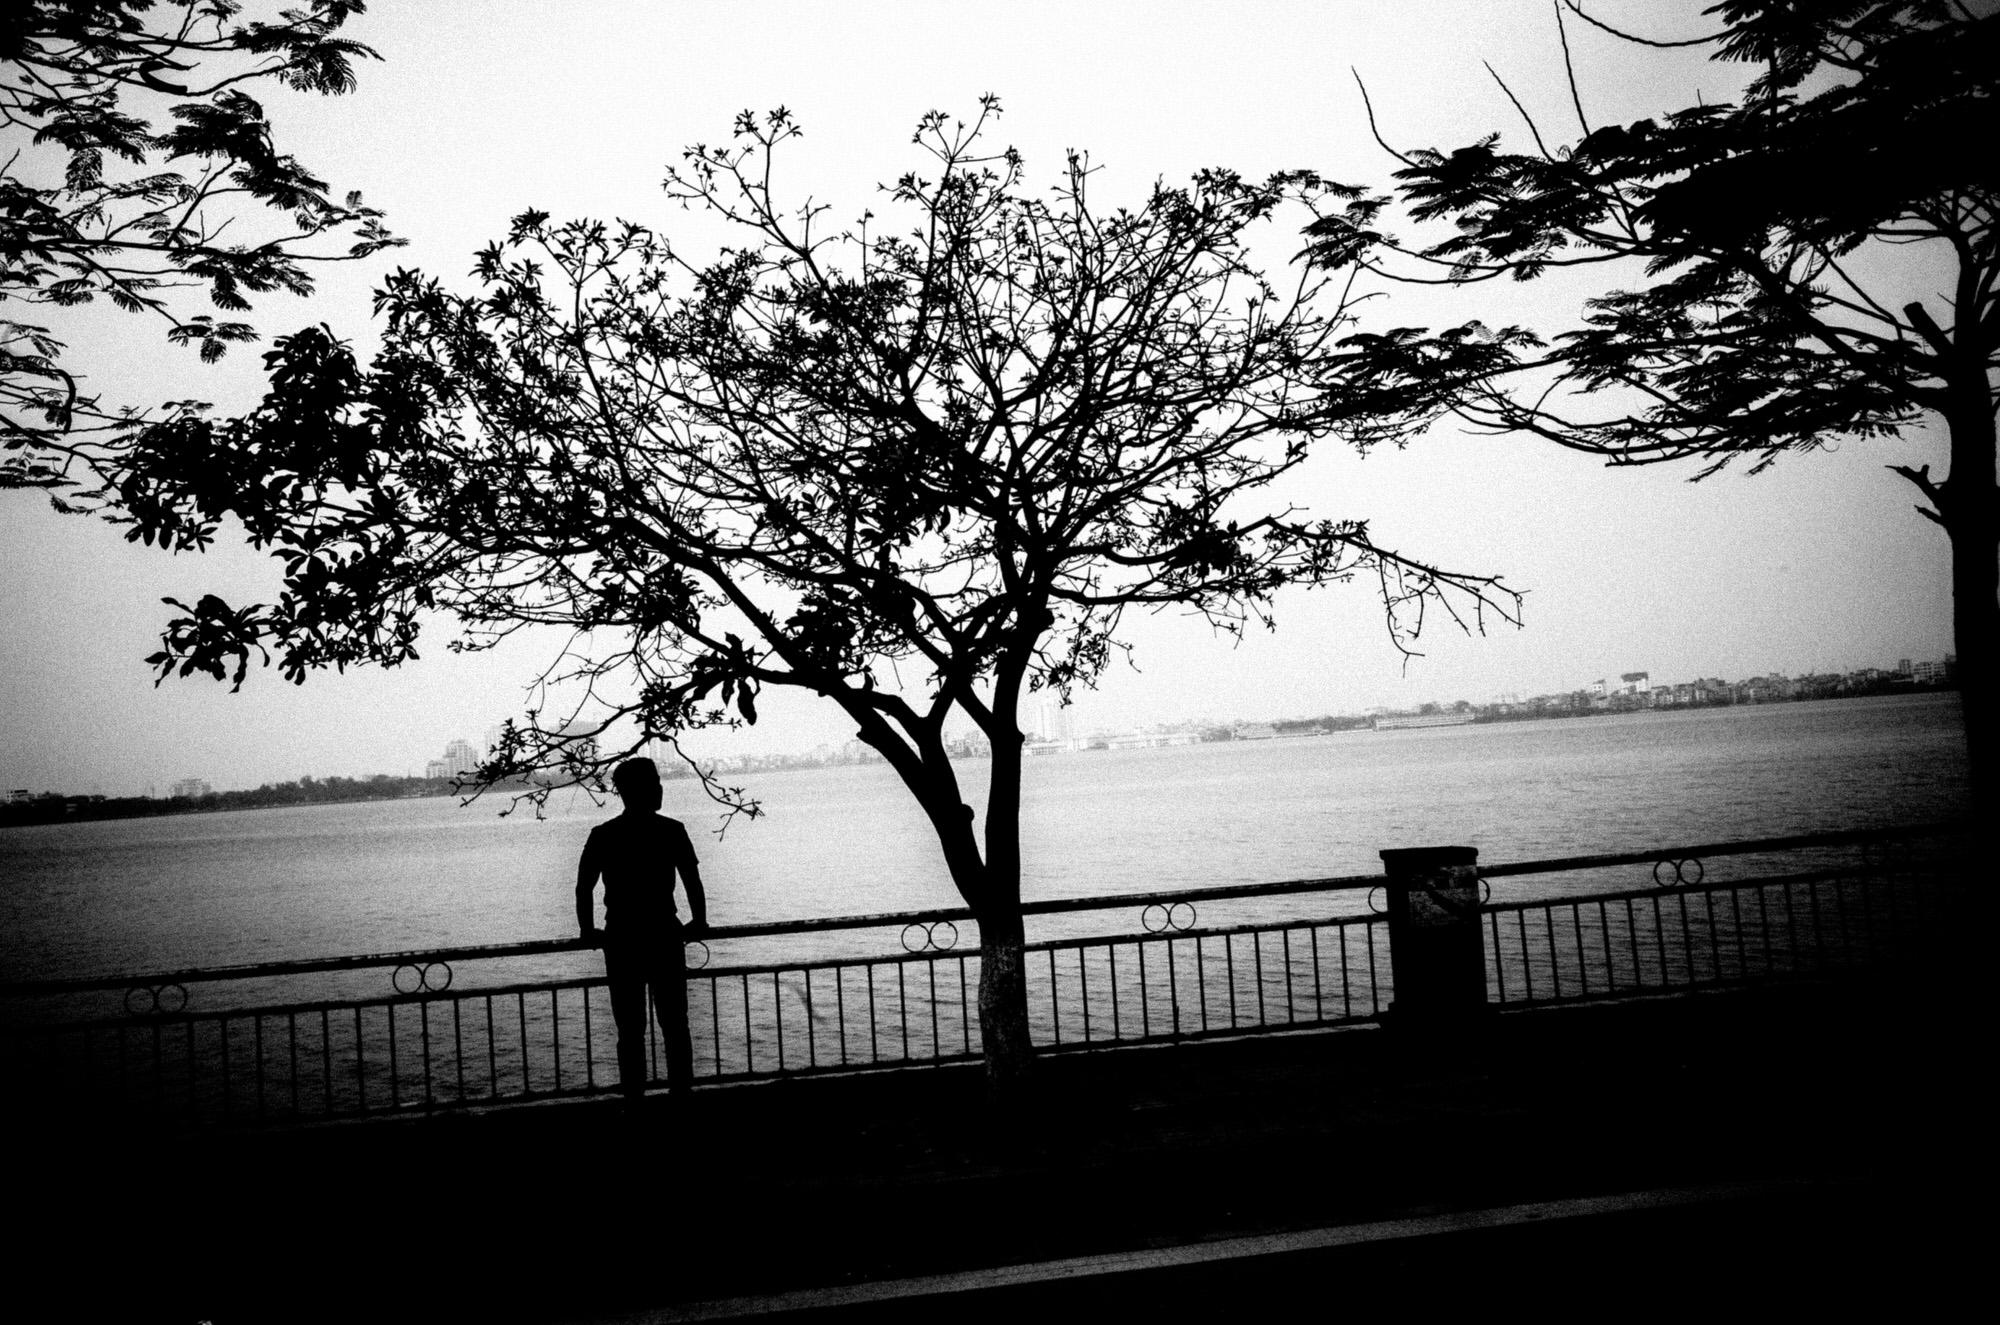 eric kim photography black and white - 33034758493_9267fb9ce0_o